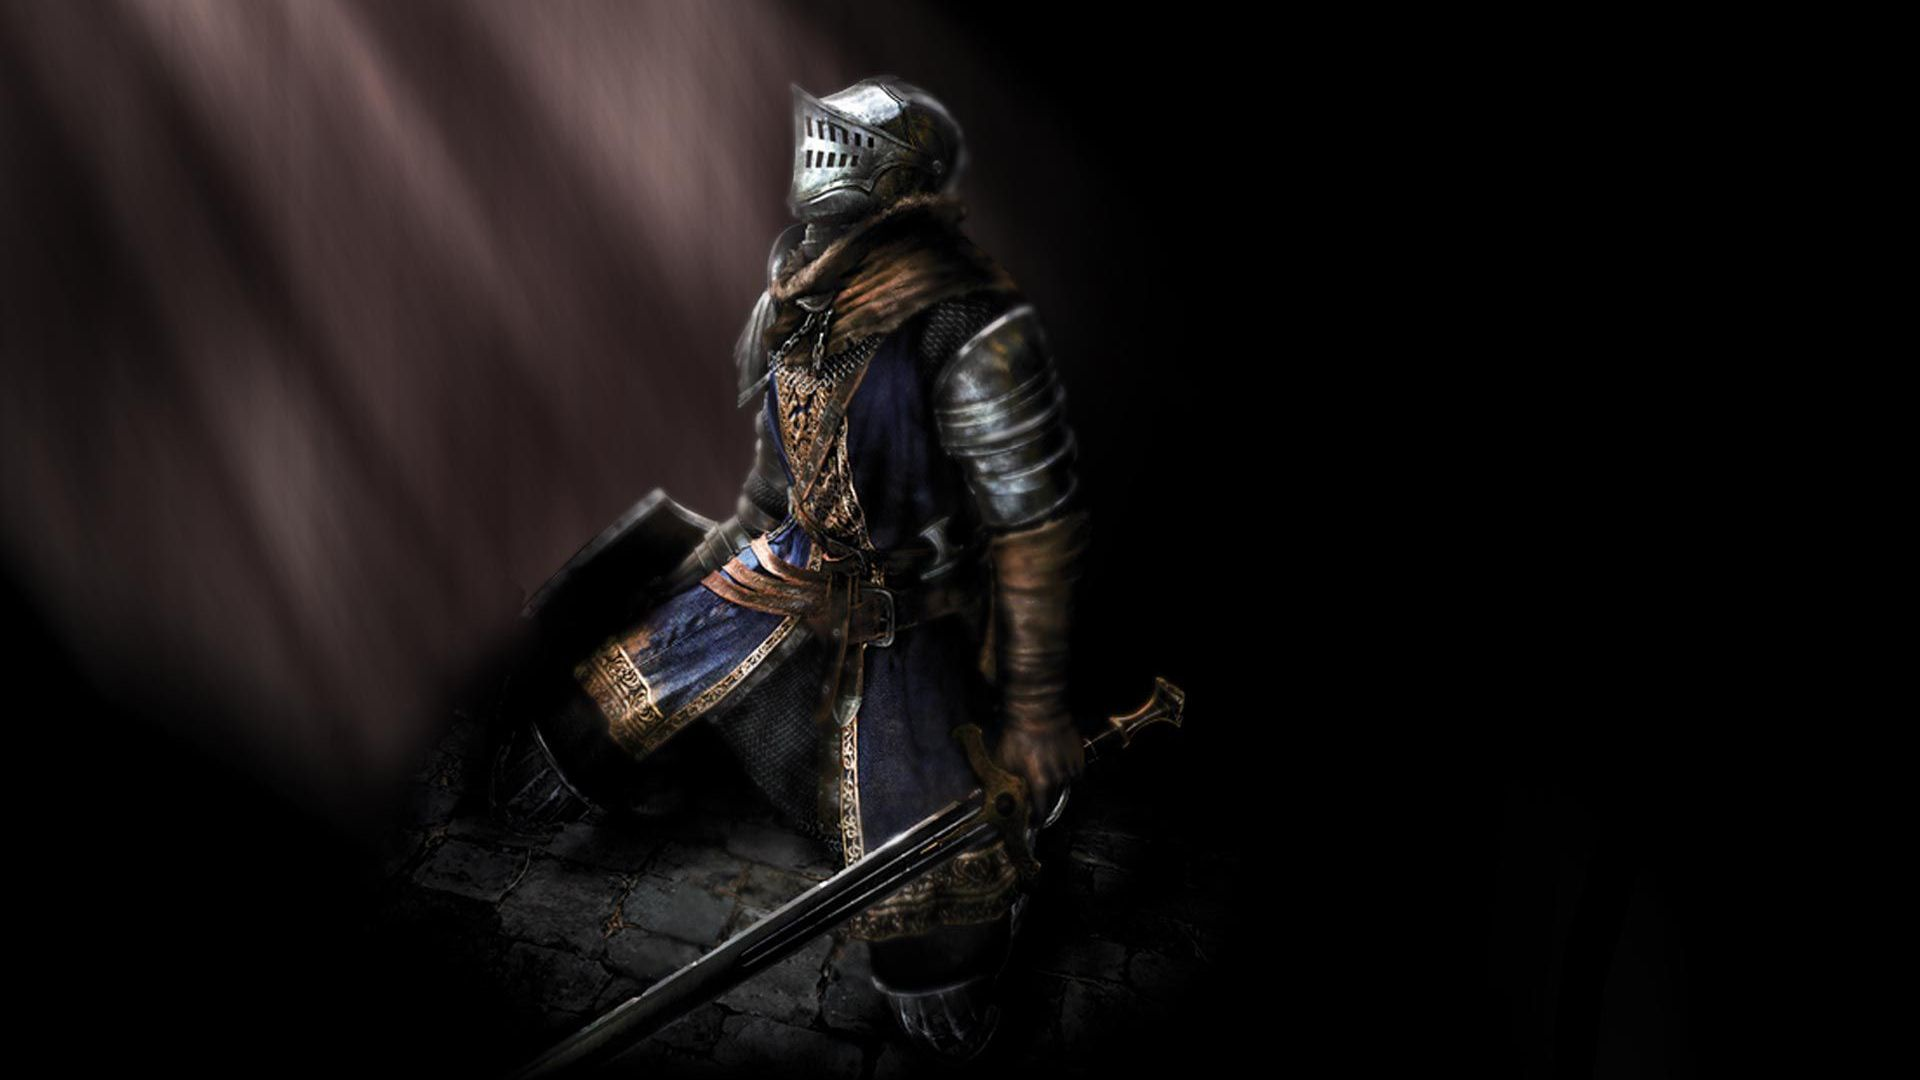 Dark Souls Board Game To Receive Kickstarter This Month